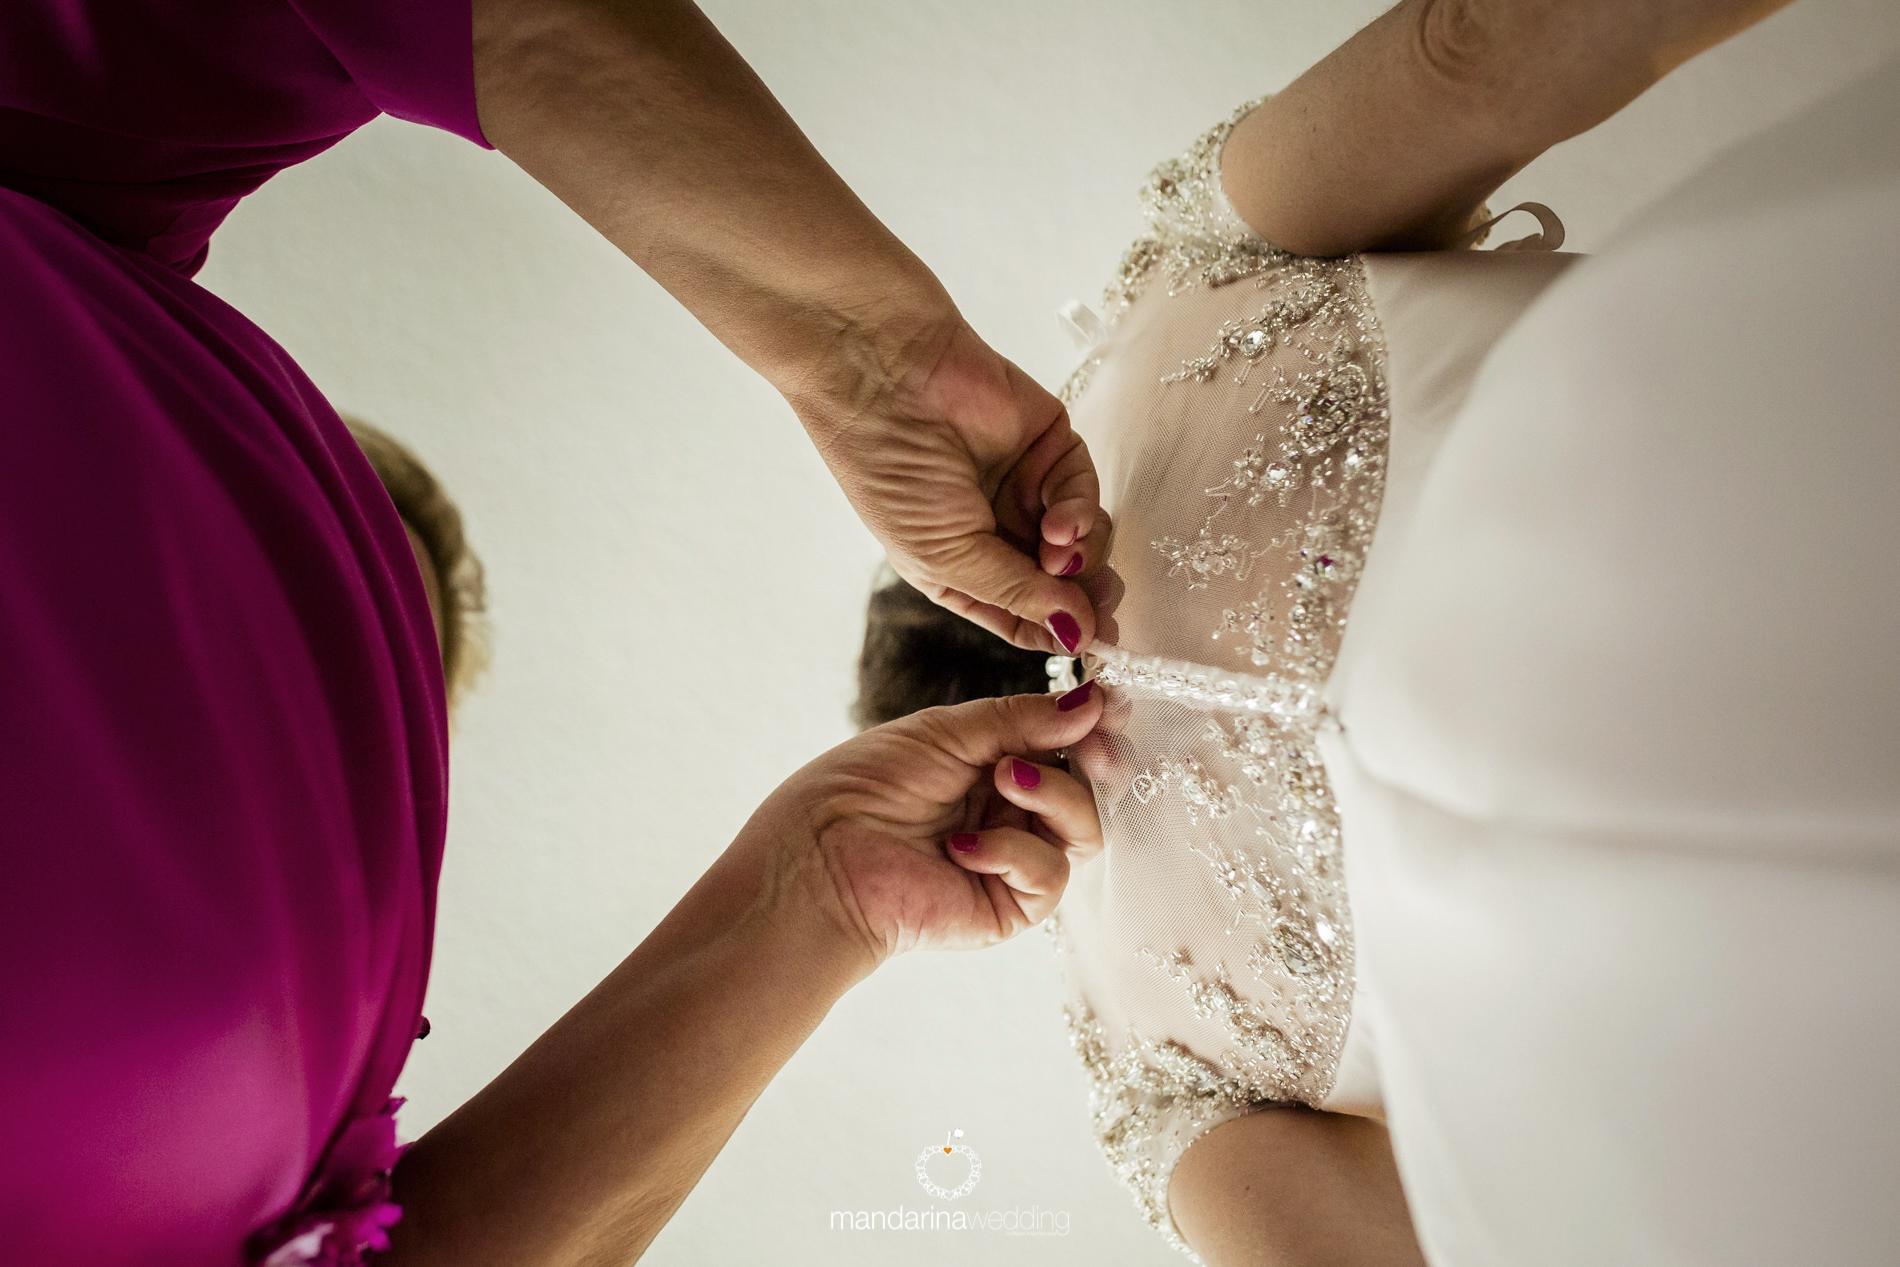 mandaria wedding, fotografos de boda, fotoperiodismo de boda, mejores fotografos de boda, bodas soria, bodas pirineo, bodas Madrid, fotógrafos tarragona_21